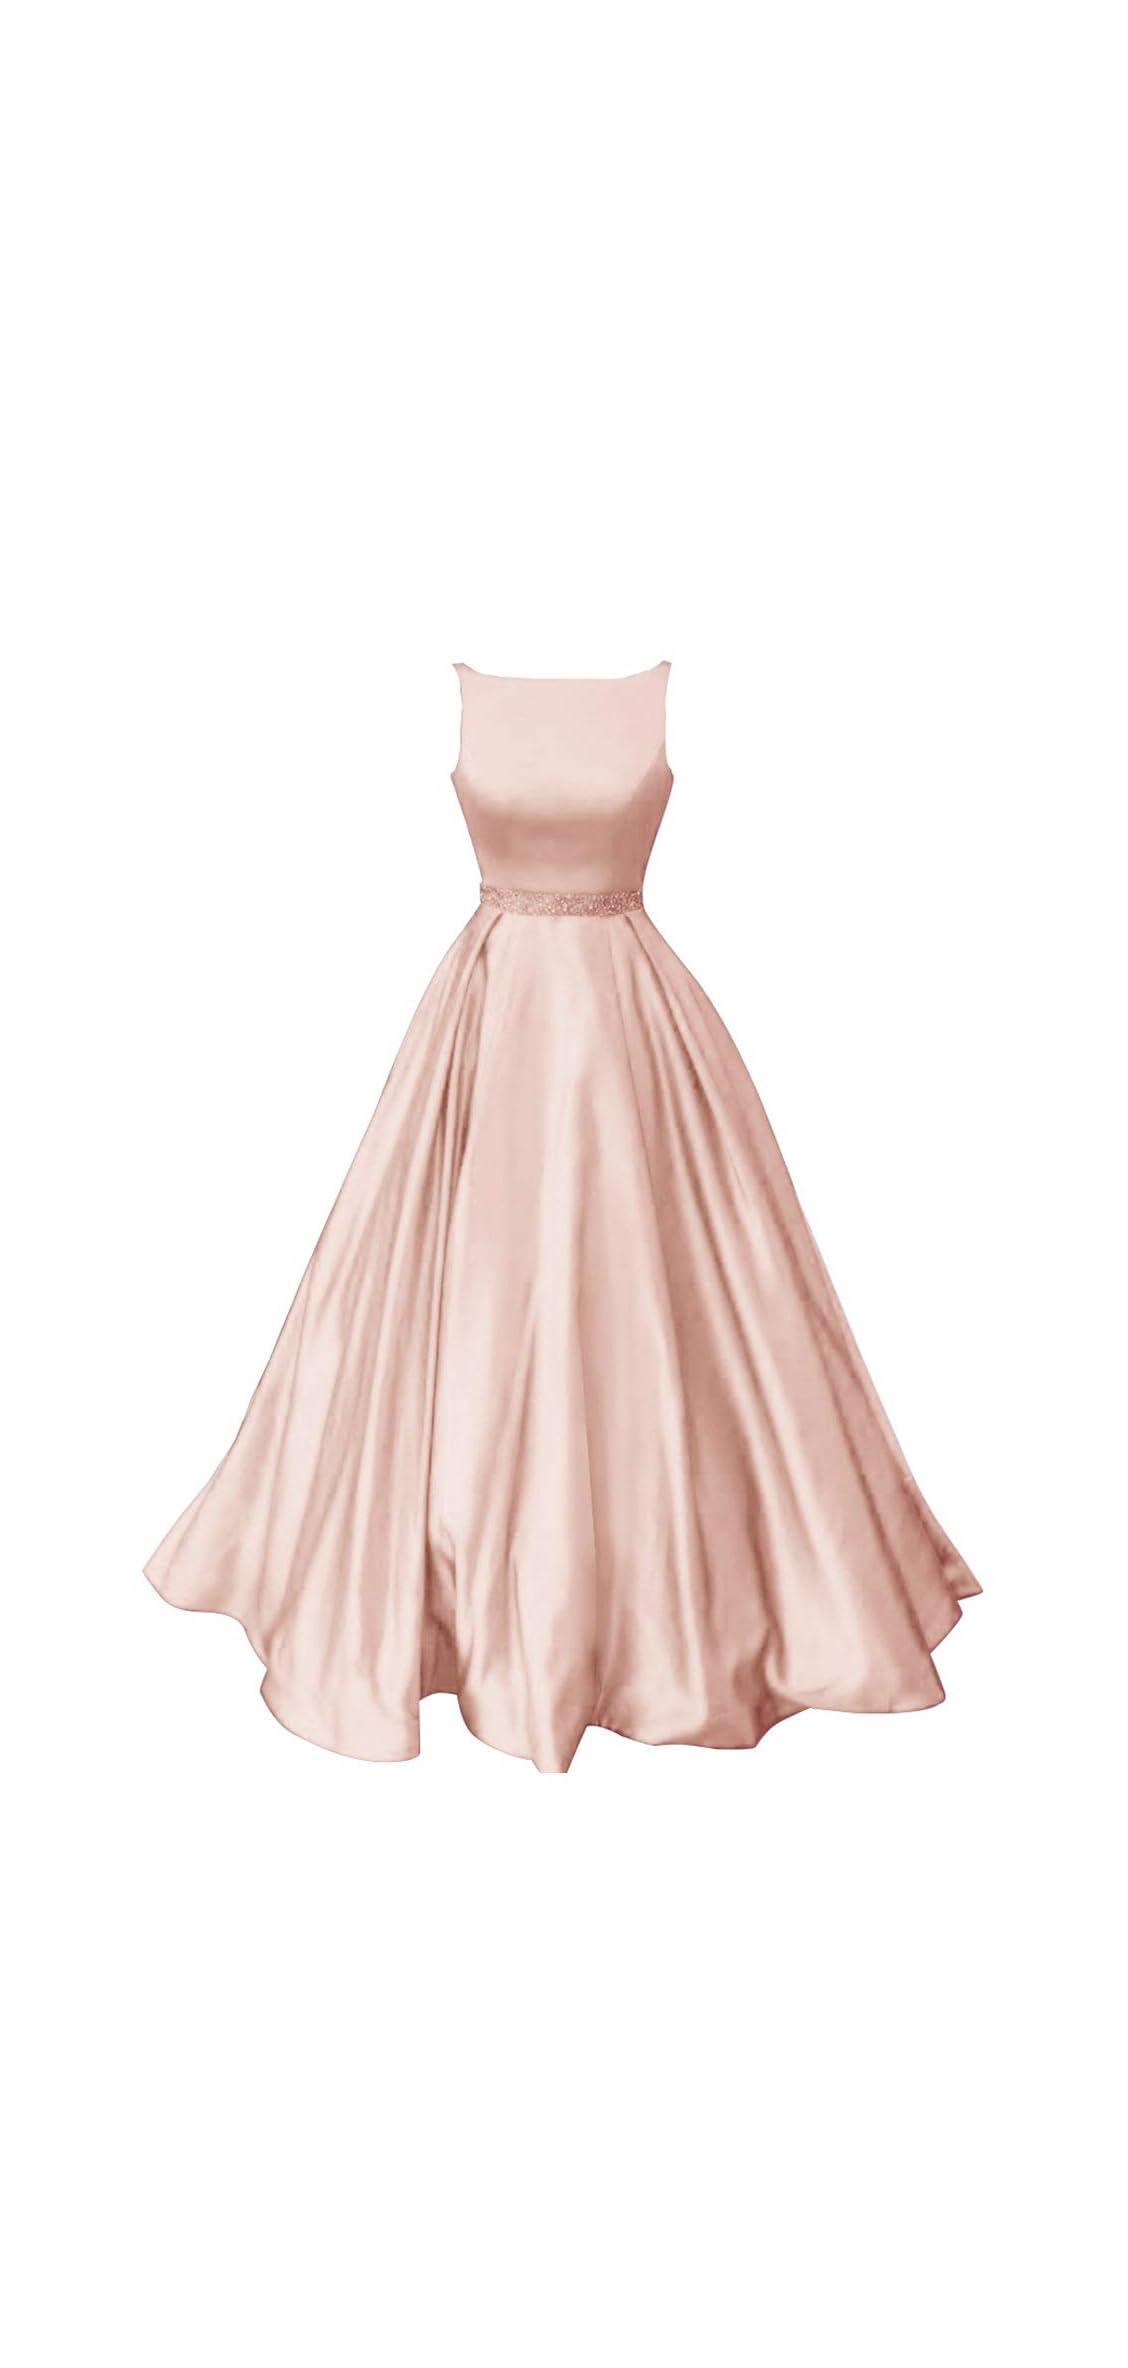 Prom Dresses Long Satin A-line Formal Dress For Women